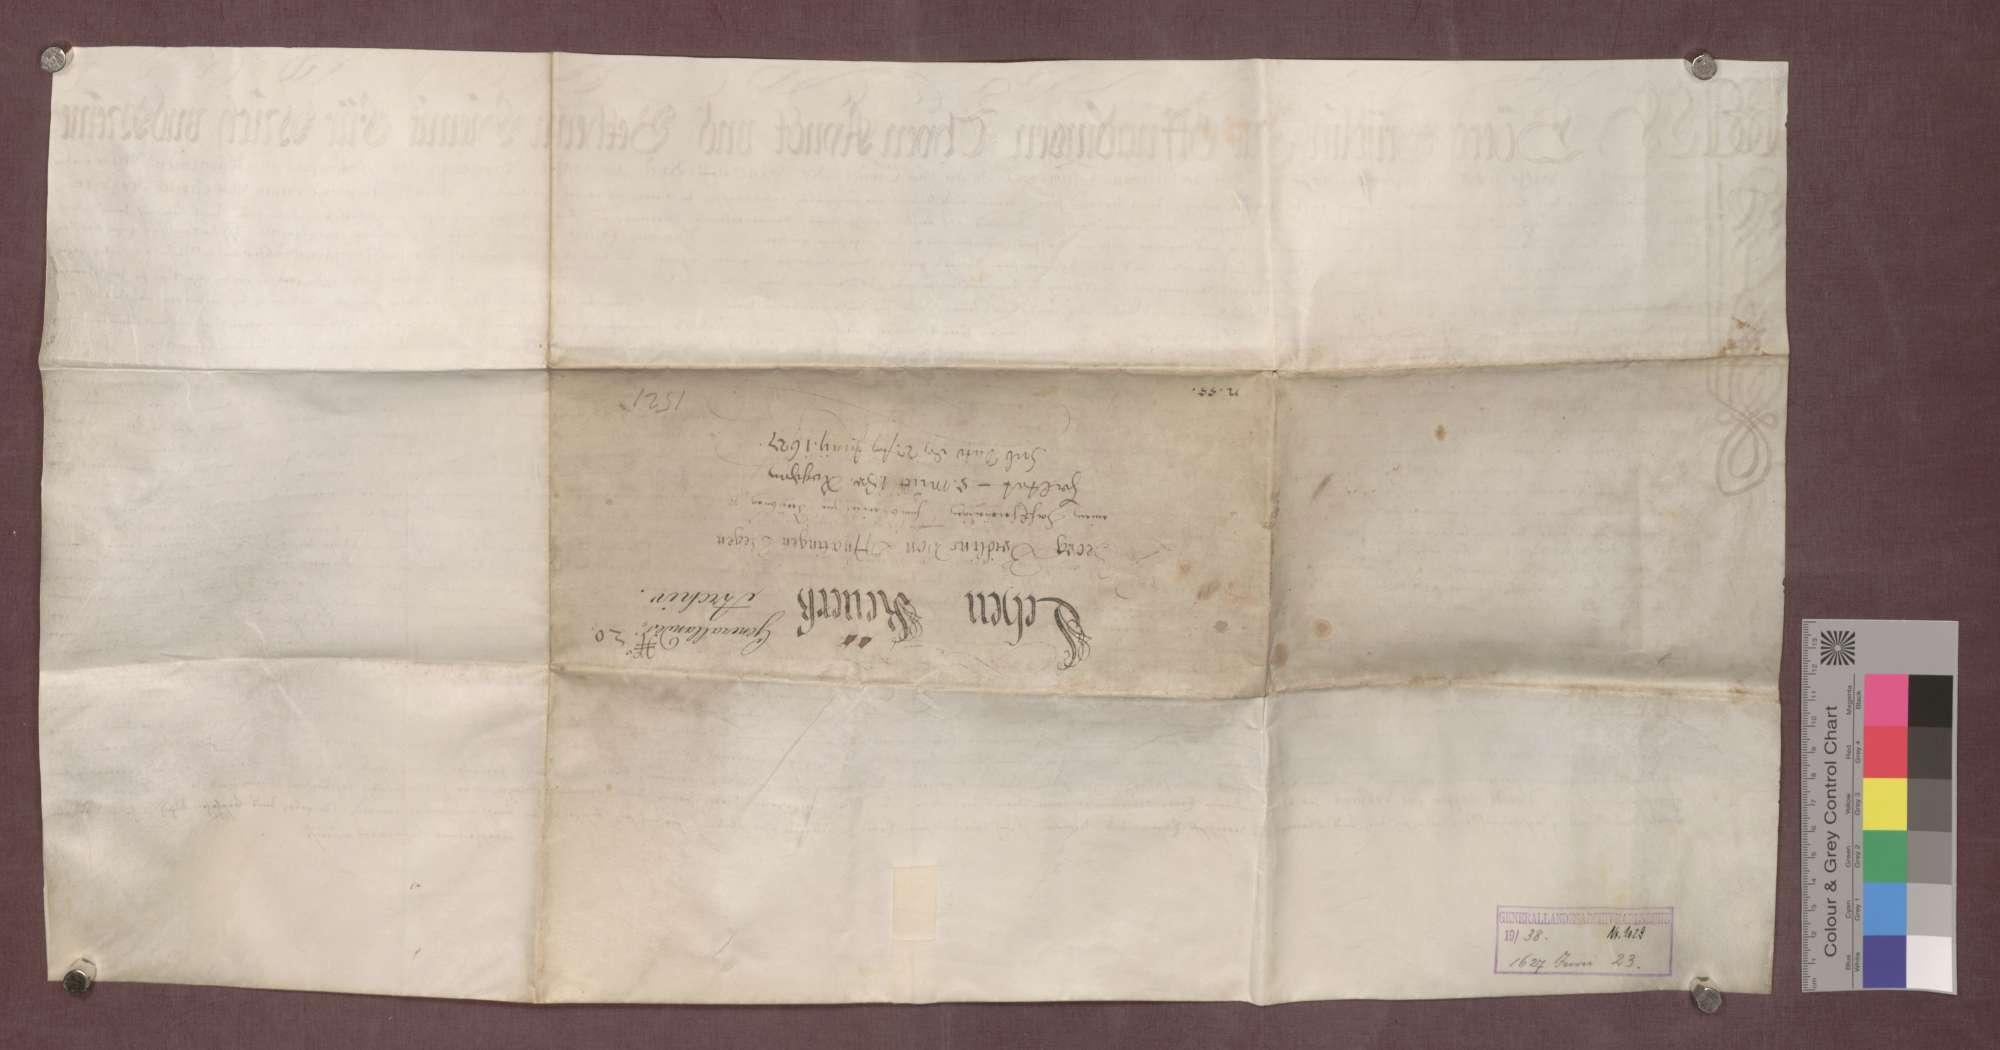 Lehnrevers des Georg Bridlin von Offnadingen gegenüber dem Basler Domkapitel über Güter im Norsinger Bann., Bild 2